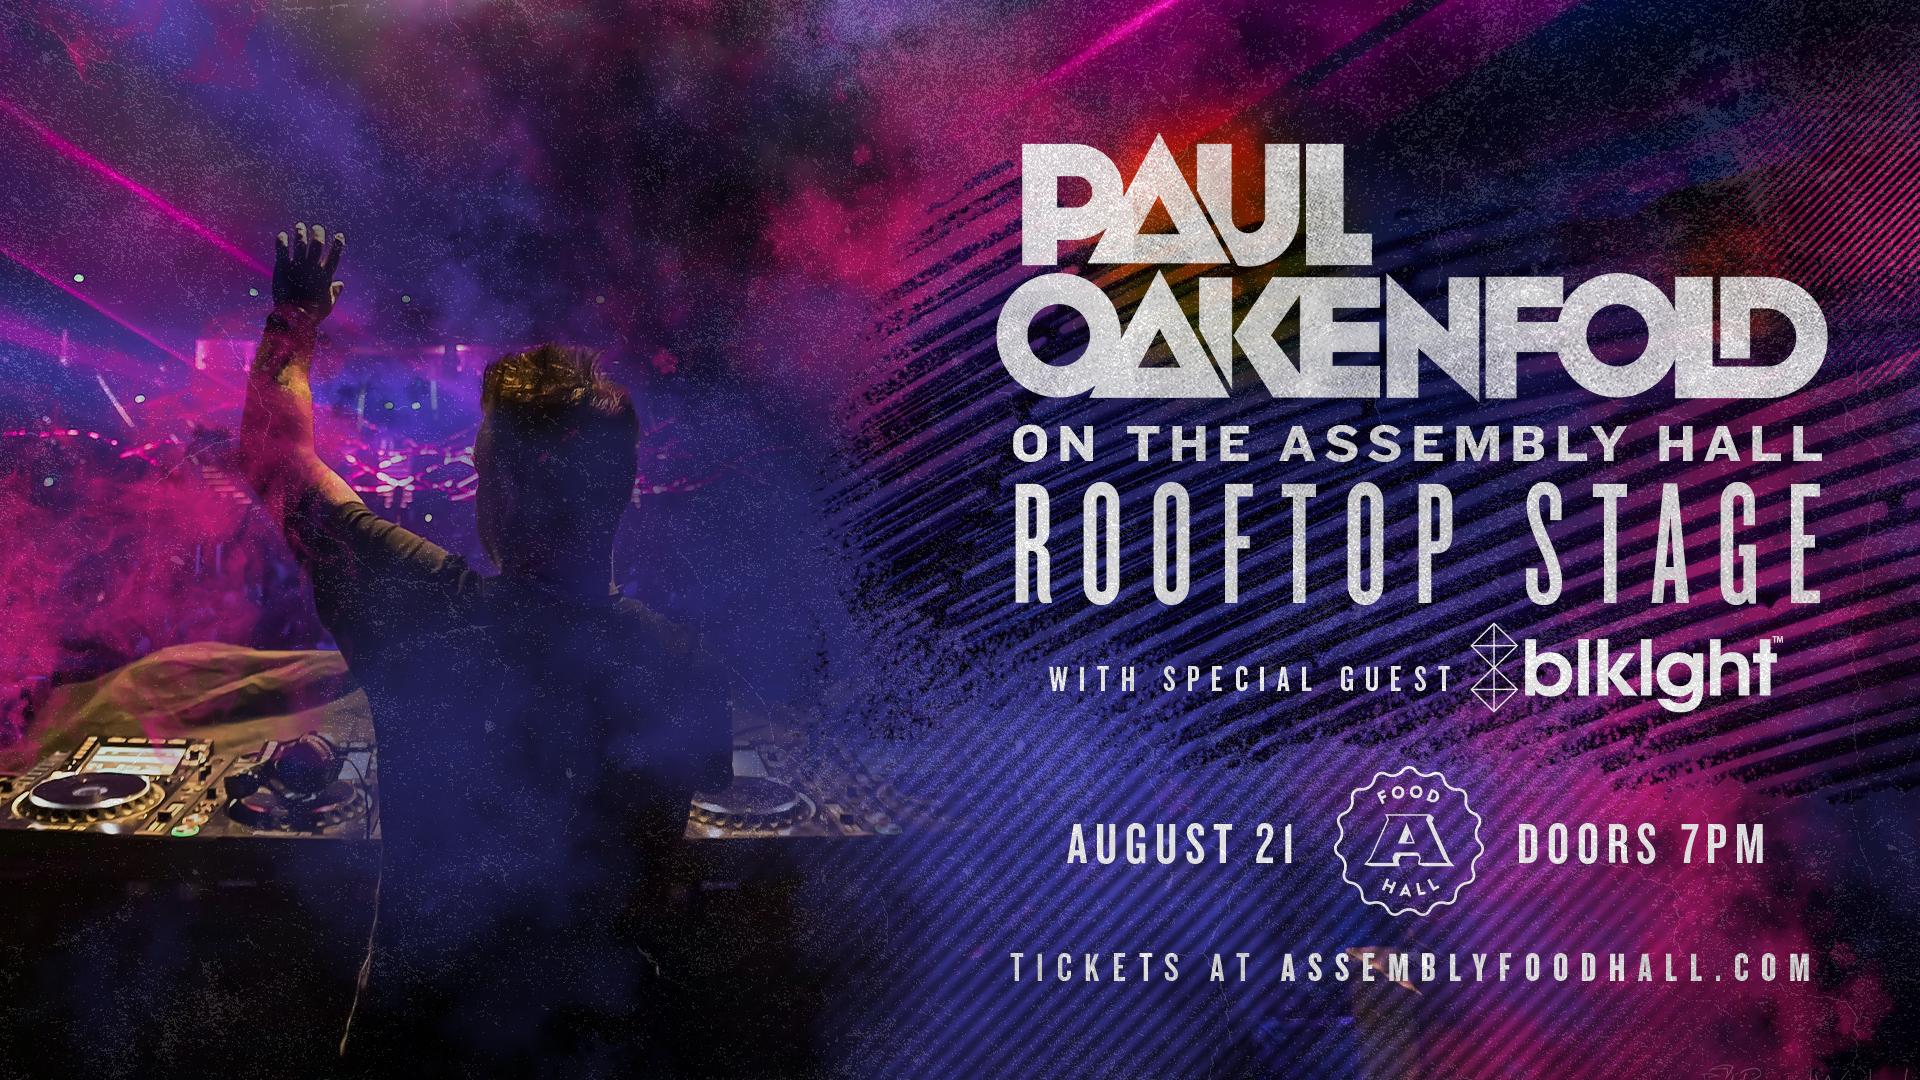 Paul Oakenfold on the Rooftop - hero